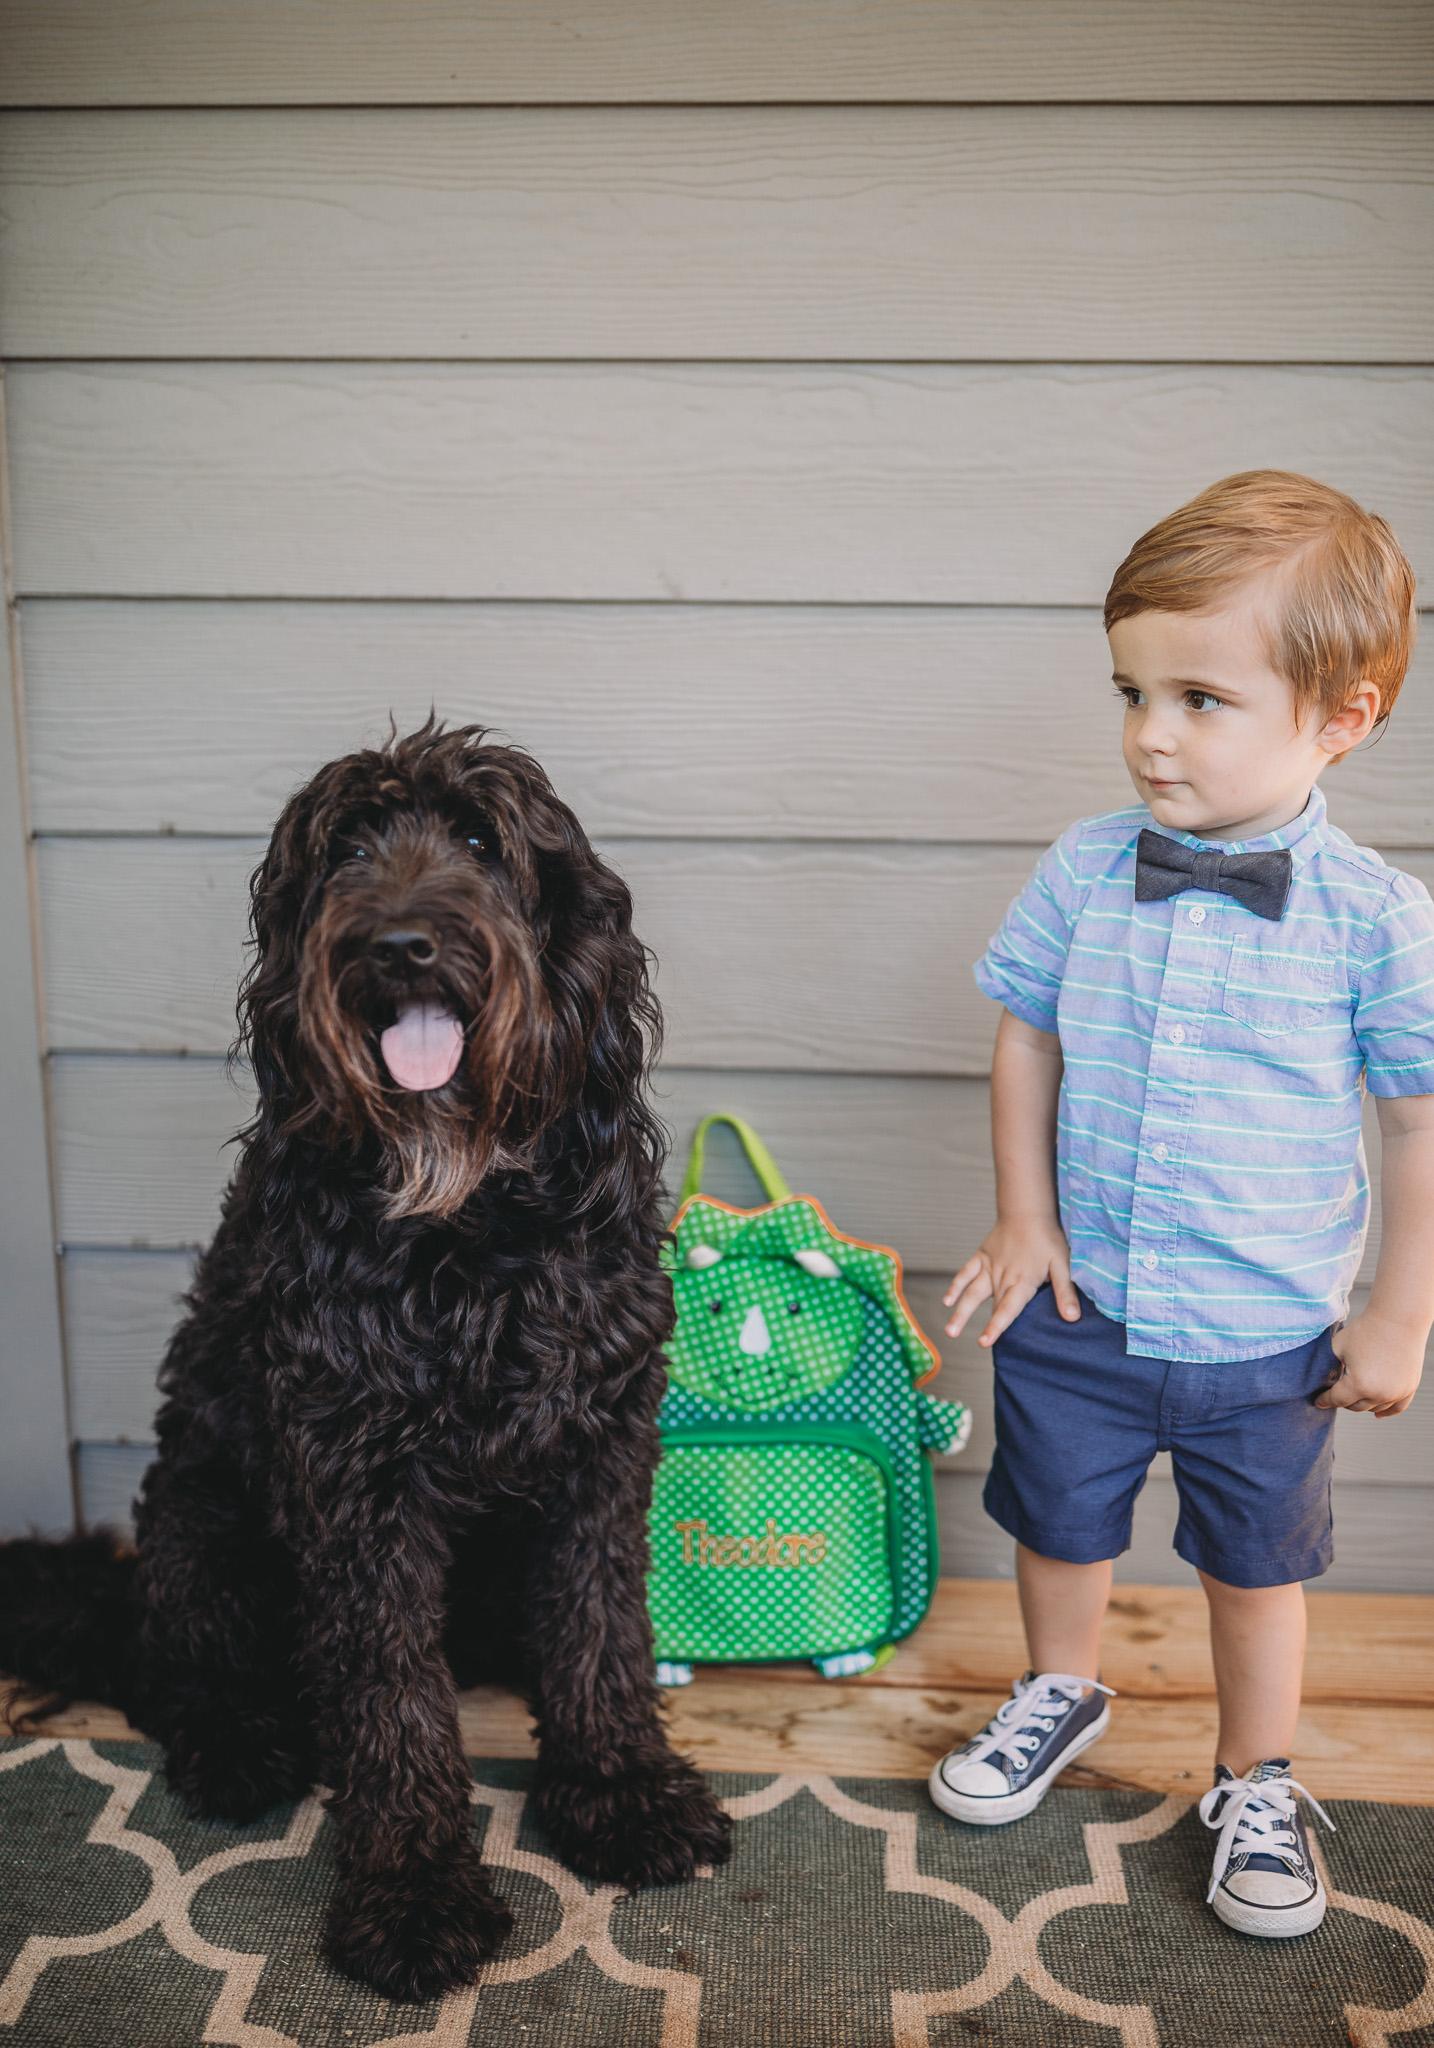 toddler and golden doodle dog